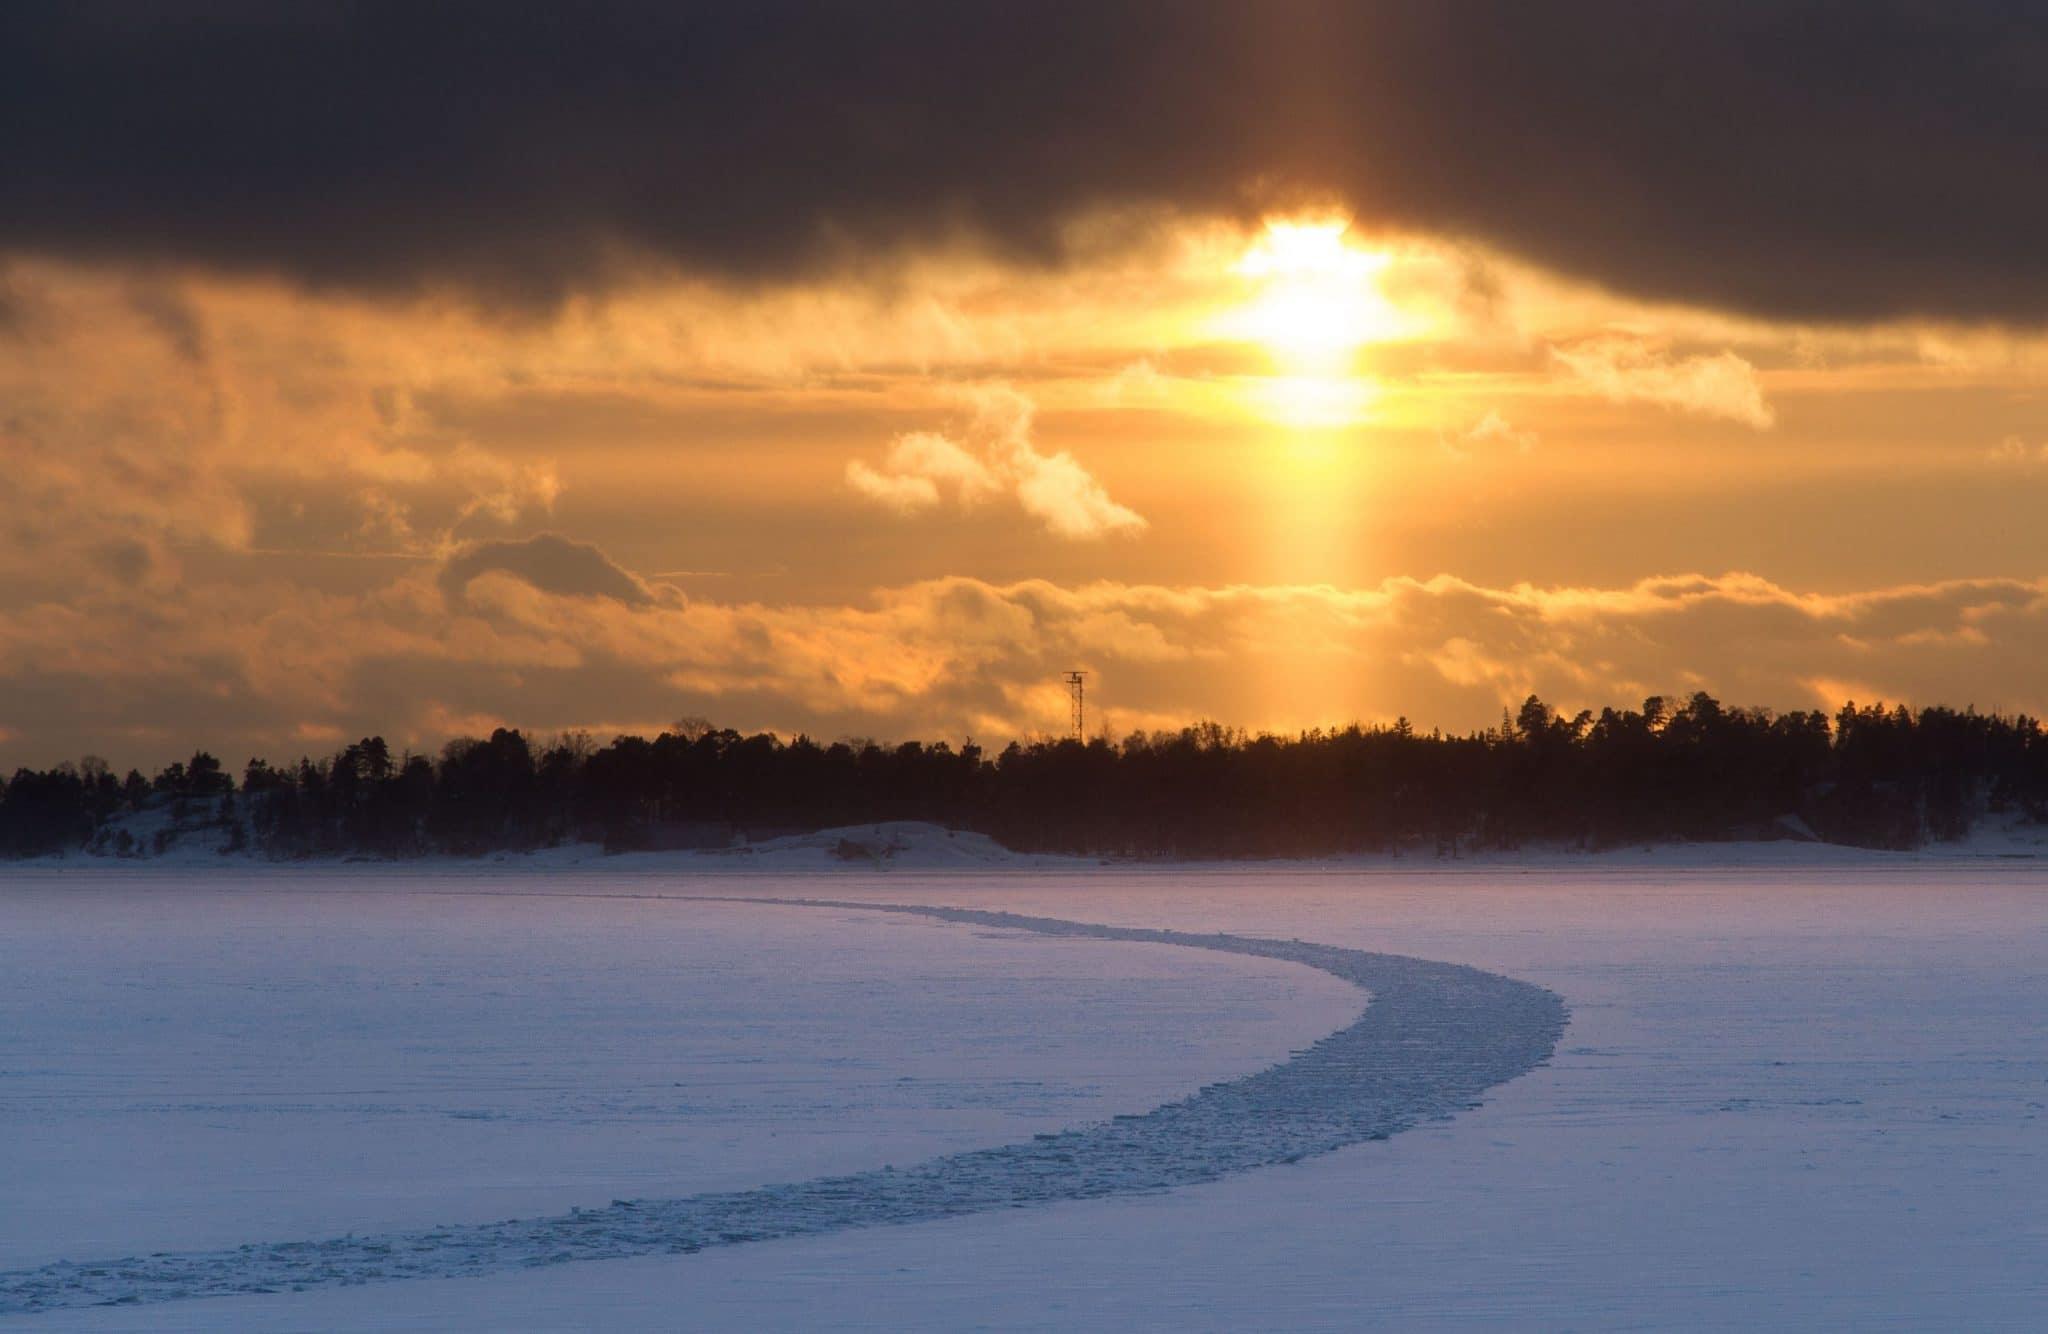 Helsinki im Winter: Sunset am Meer ©Foto: Tarja Prüss   Tarjas Blog - Alles über Finnland